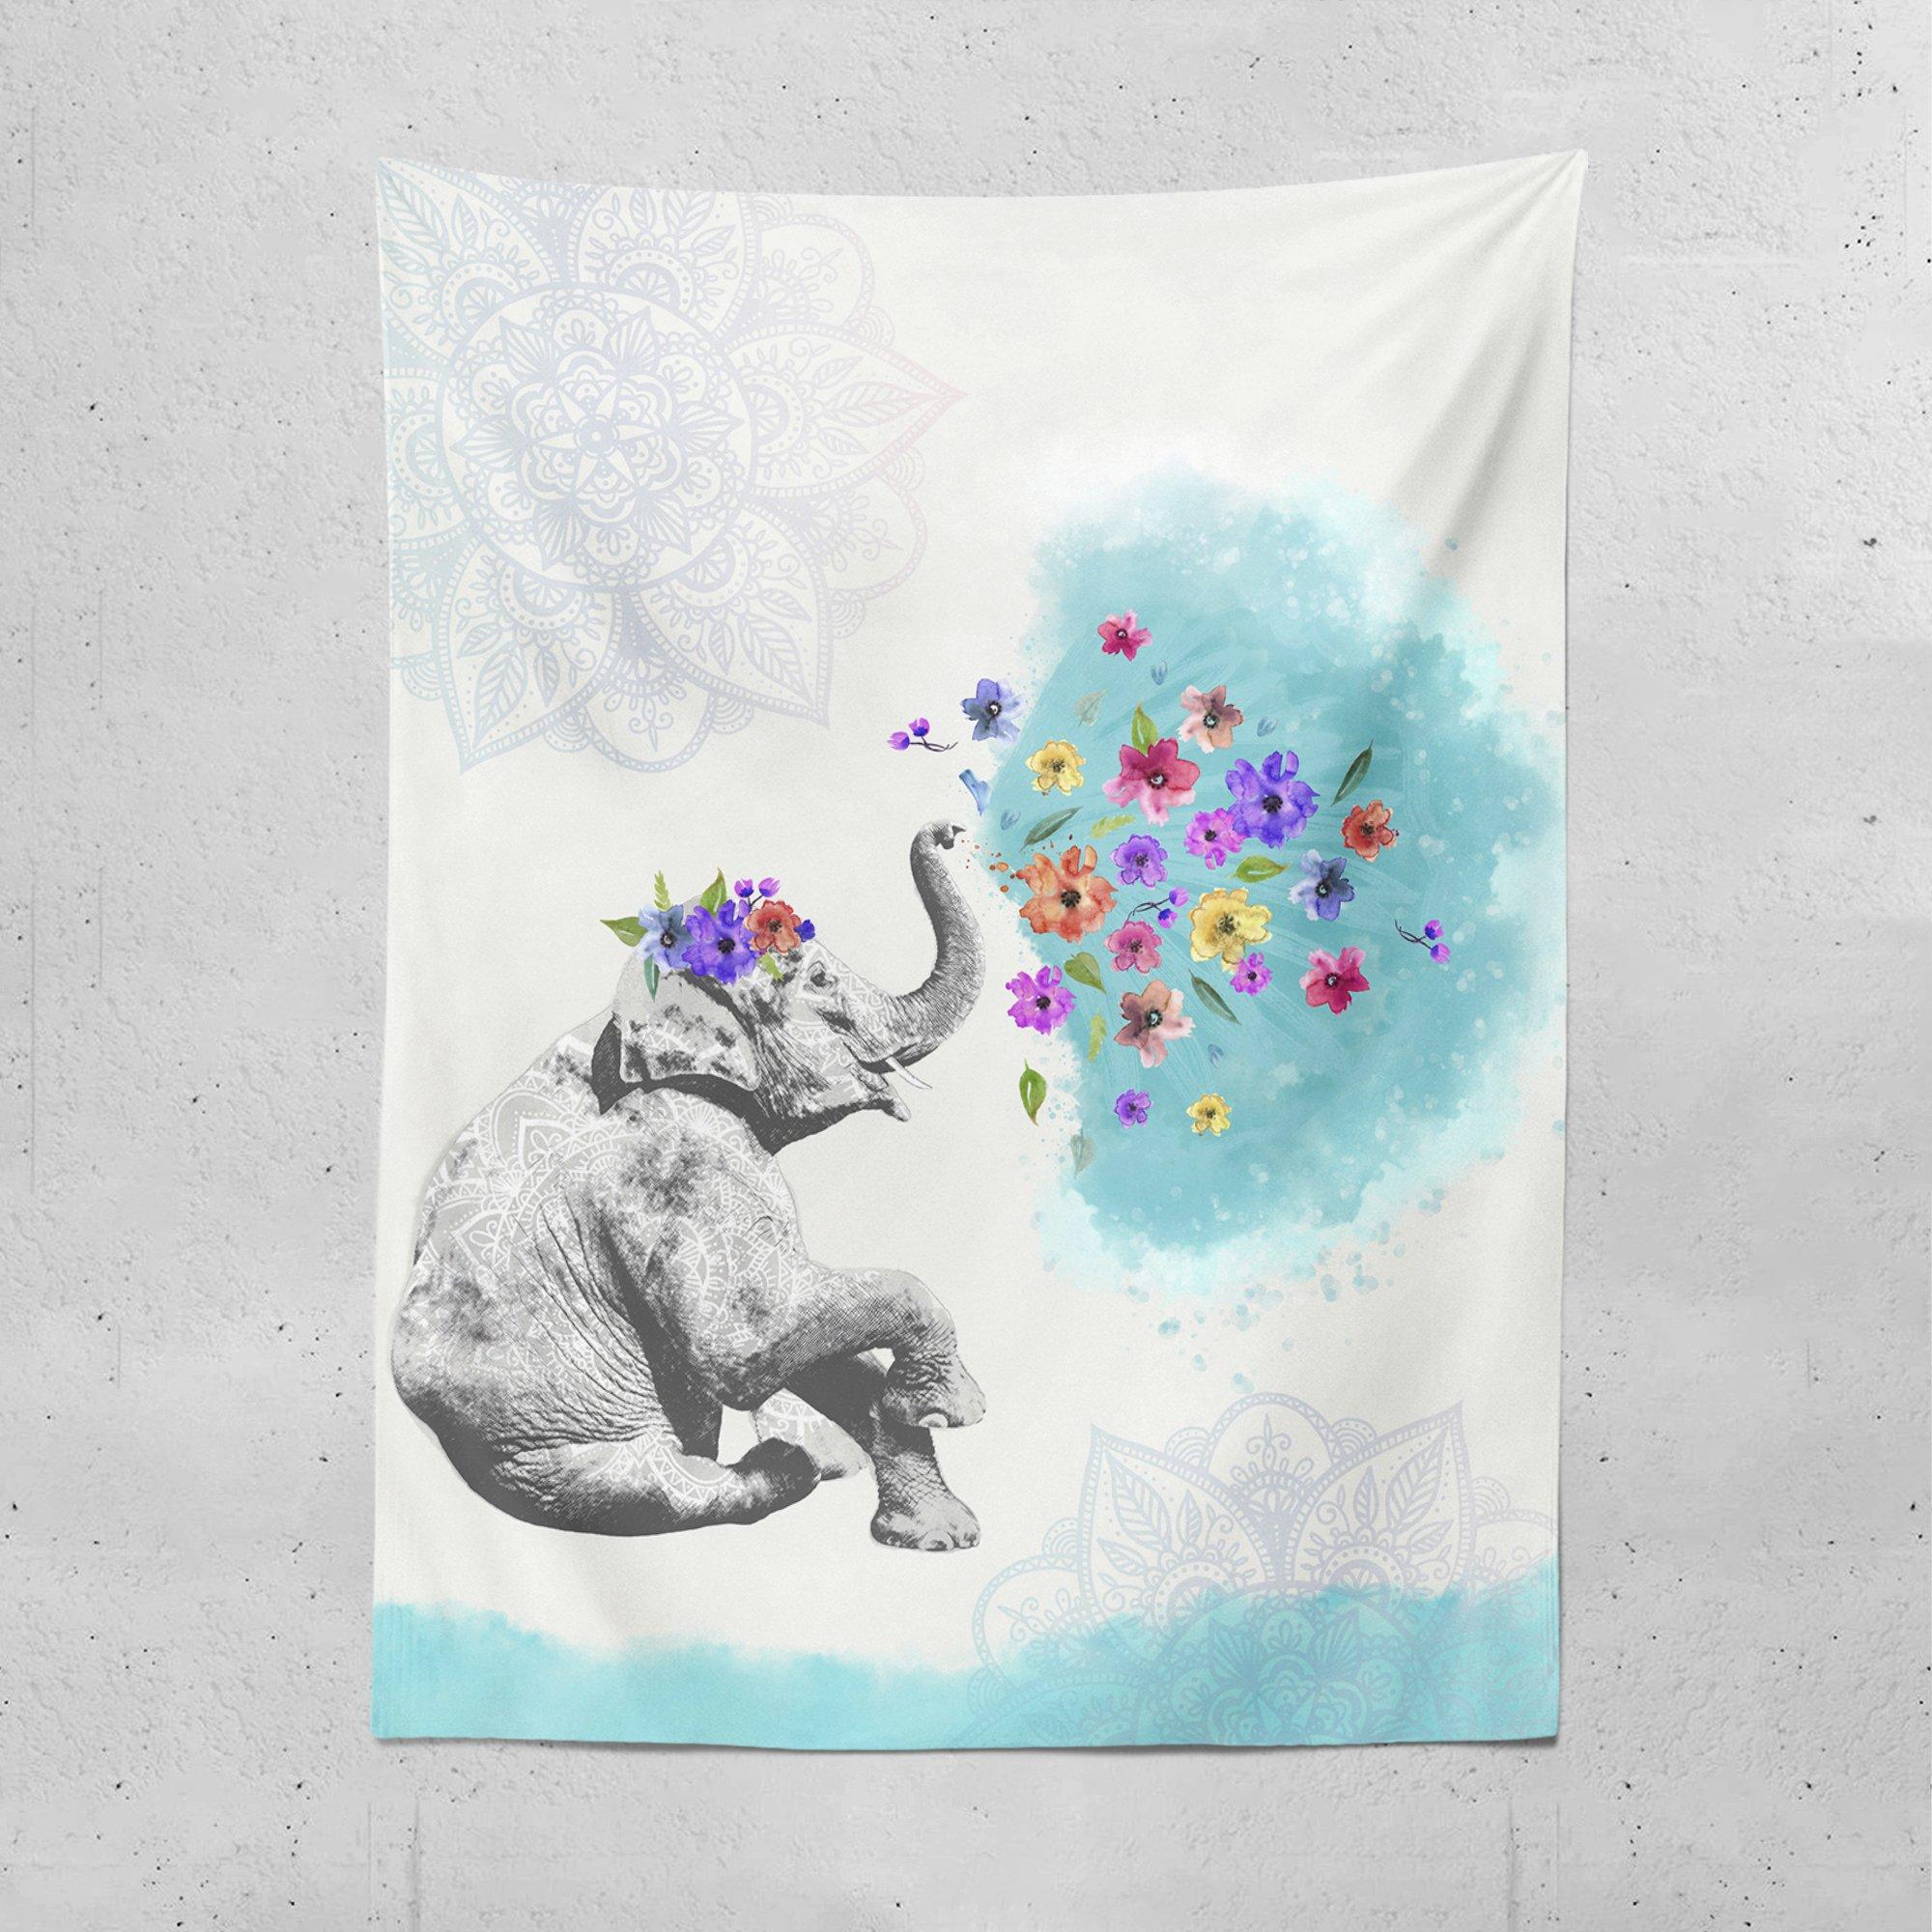 Lume.ly - Cute Mandala Elephant Wall Hanging Tapestry For Bedroom or Beach, Bohemian, Unique Elegant Designer Vibrant Art Decor Home Tapestries, (Aqua Blue White Pink Purple) (60x80 inches)